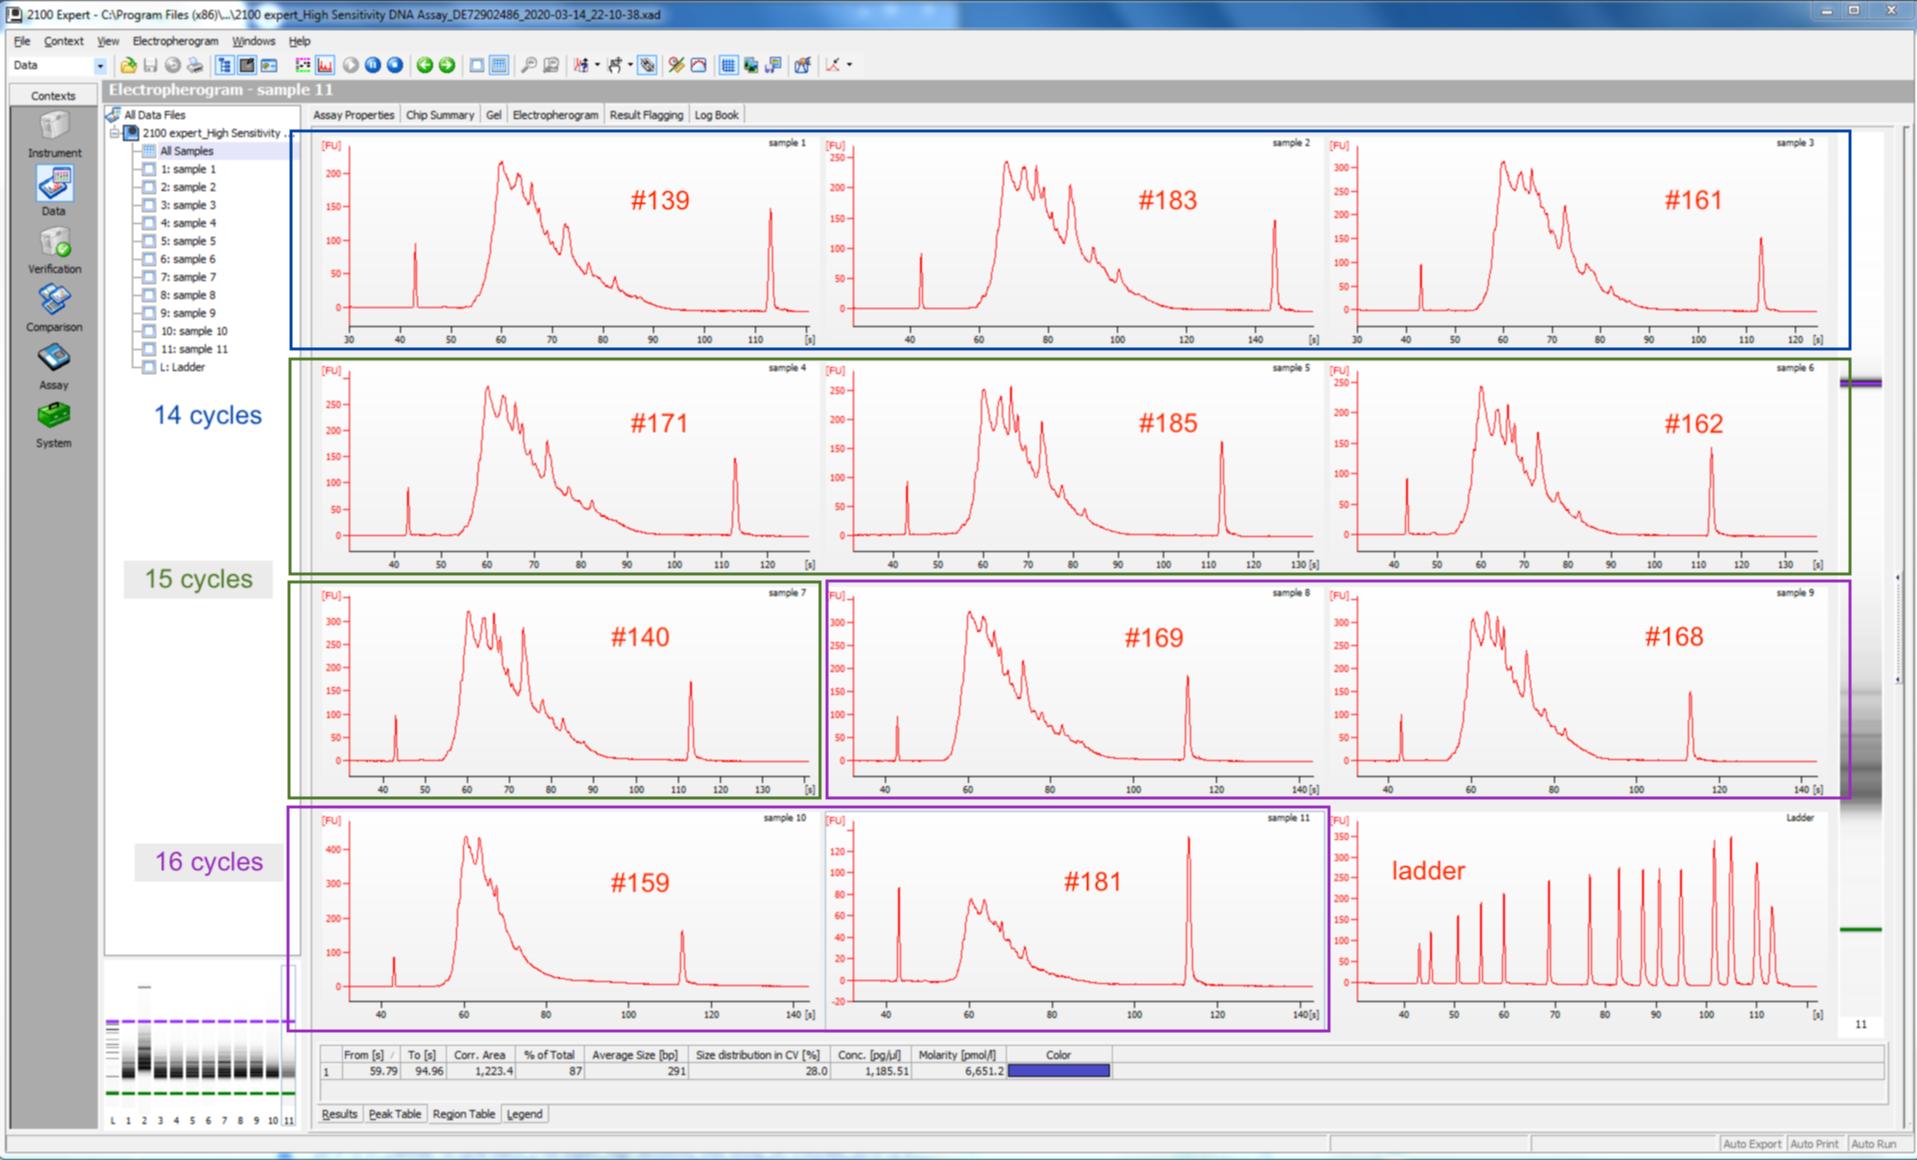 2020-03-14_quantseq-juvenile_dsDNA-libraries-peaks